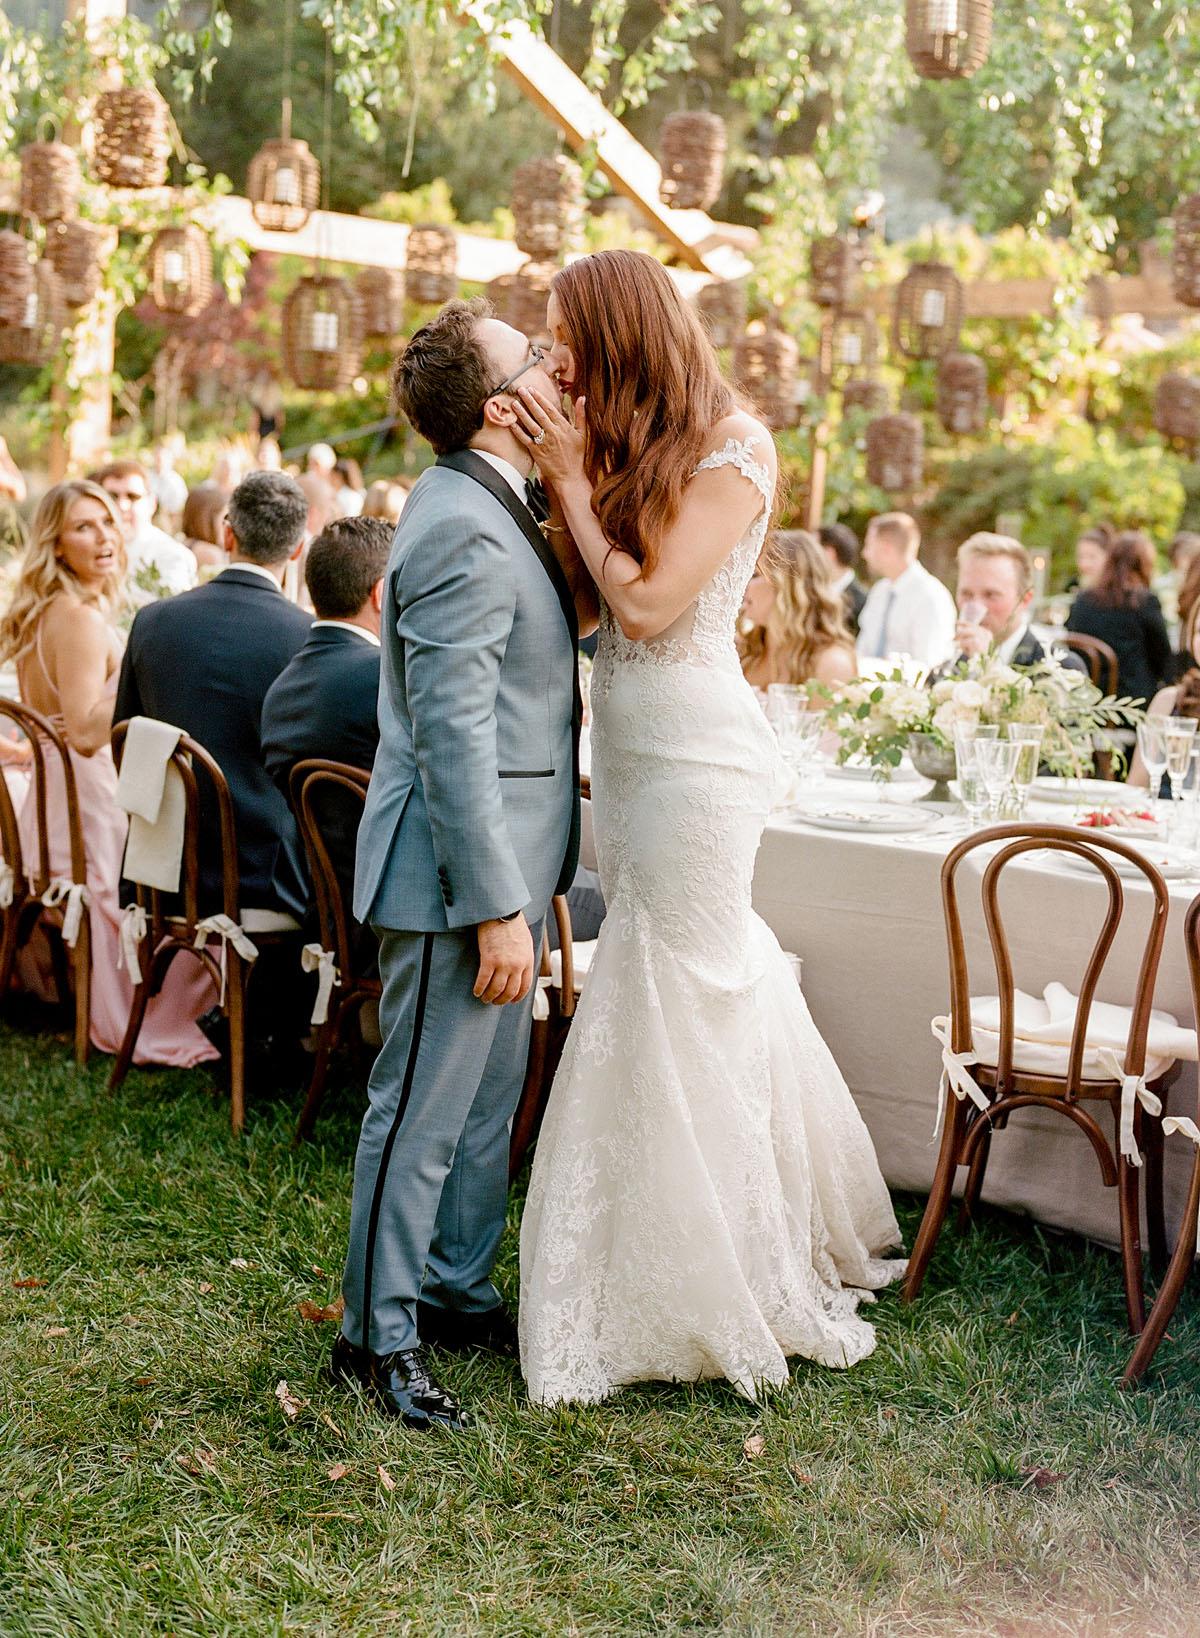 54-bride-groom-kiss-wedding.jpg